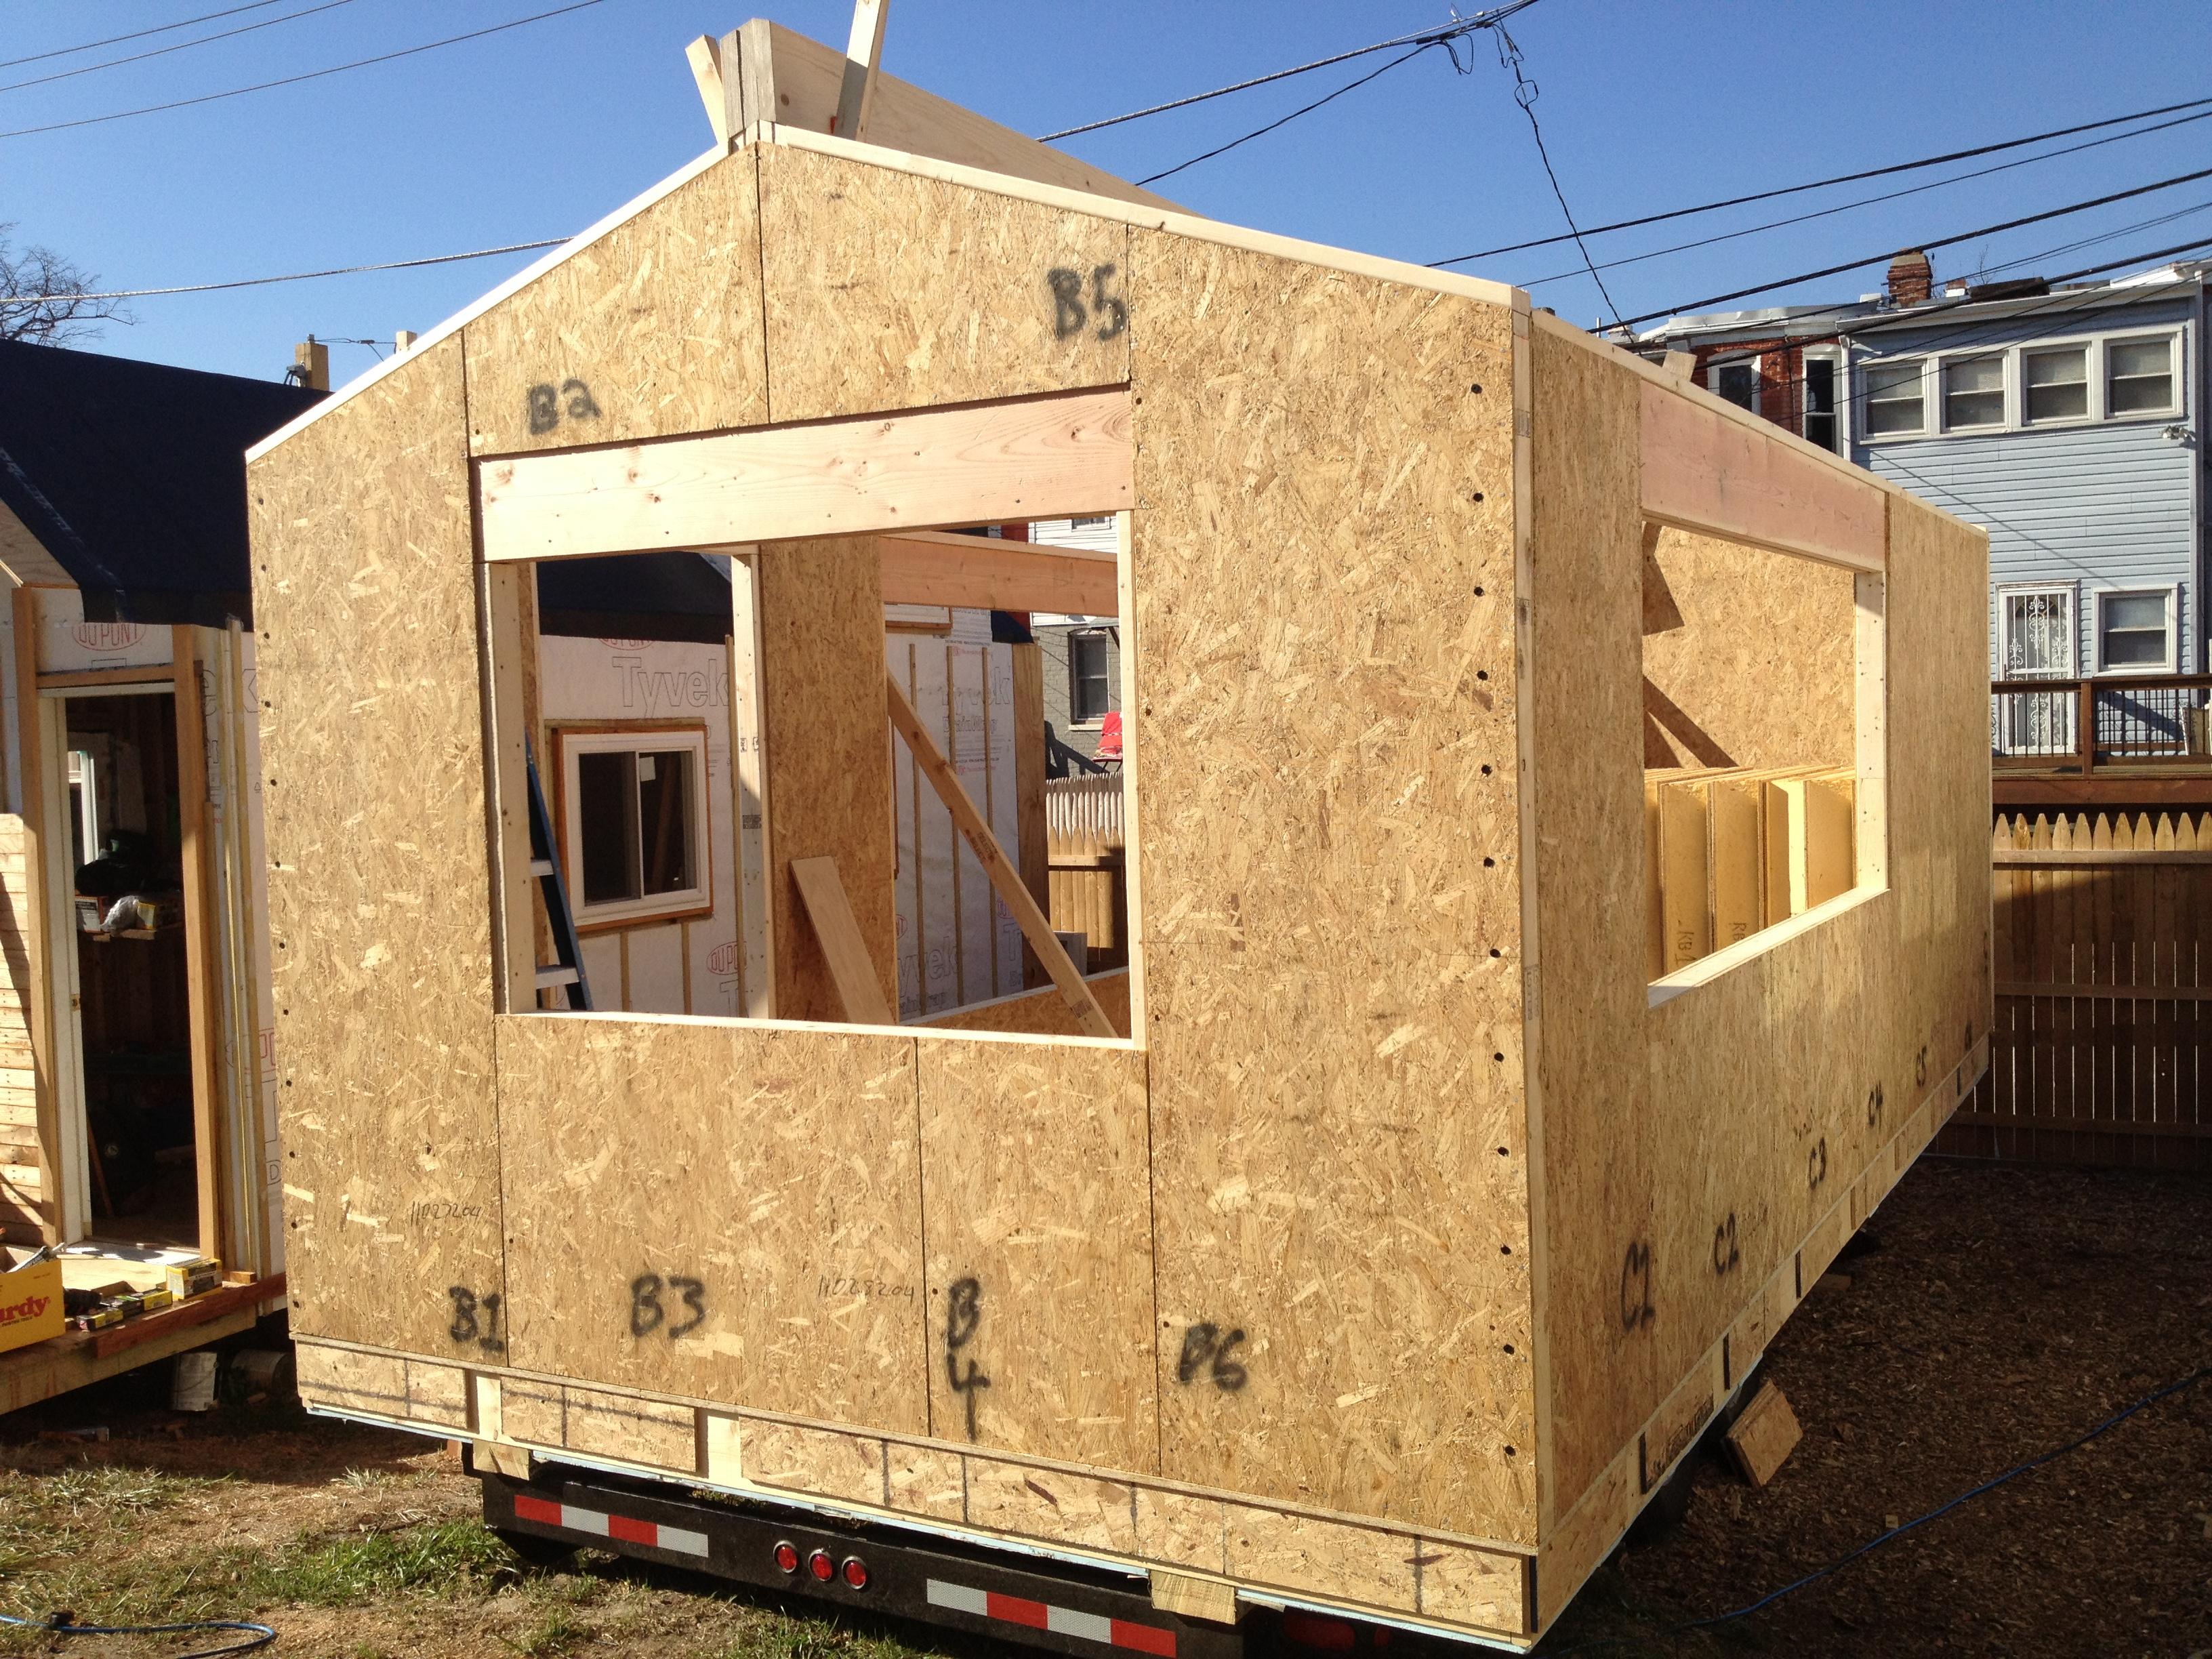 Minim house construction starts